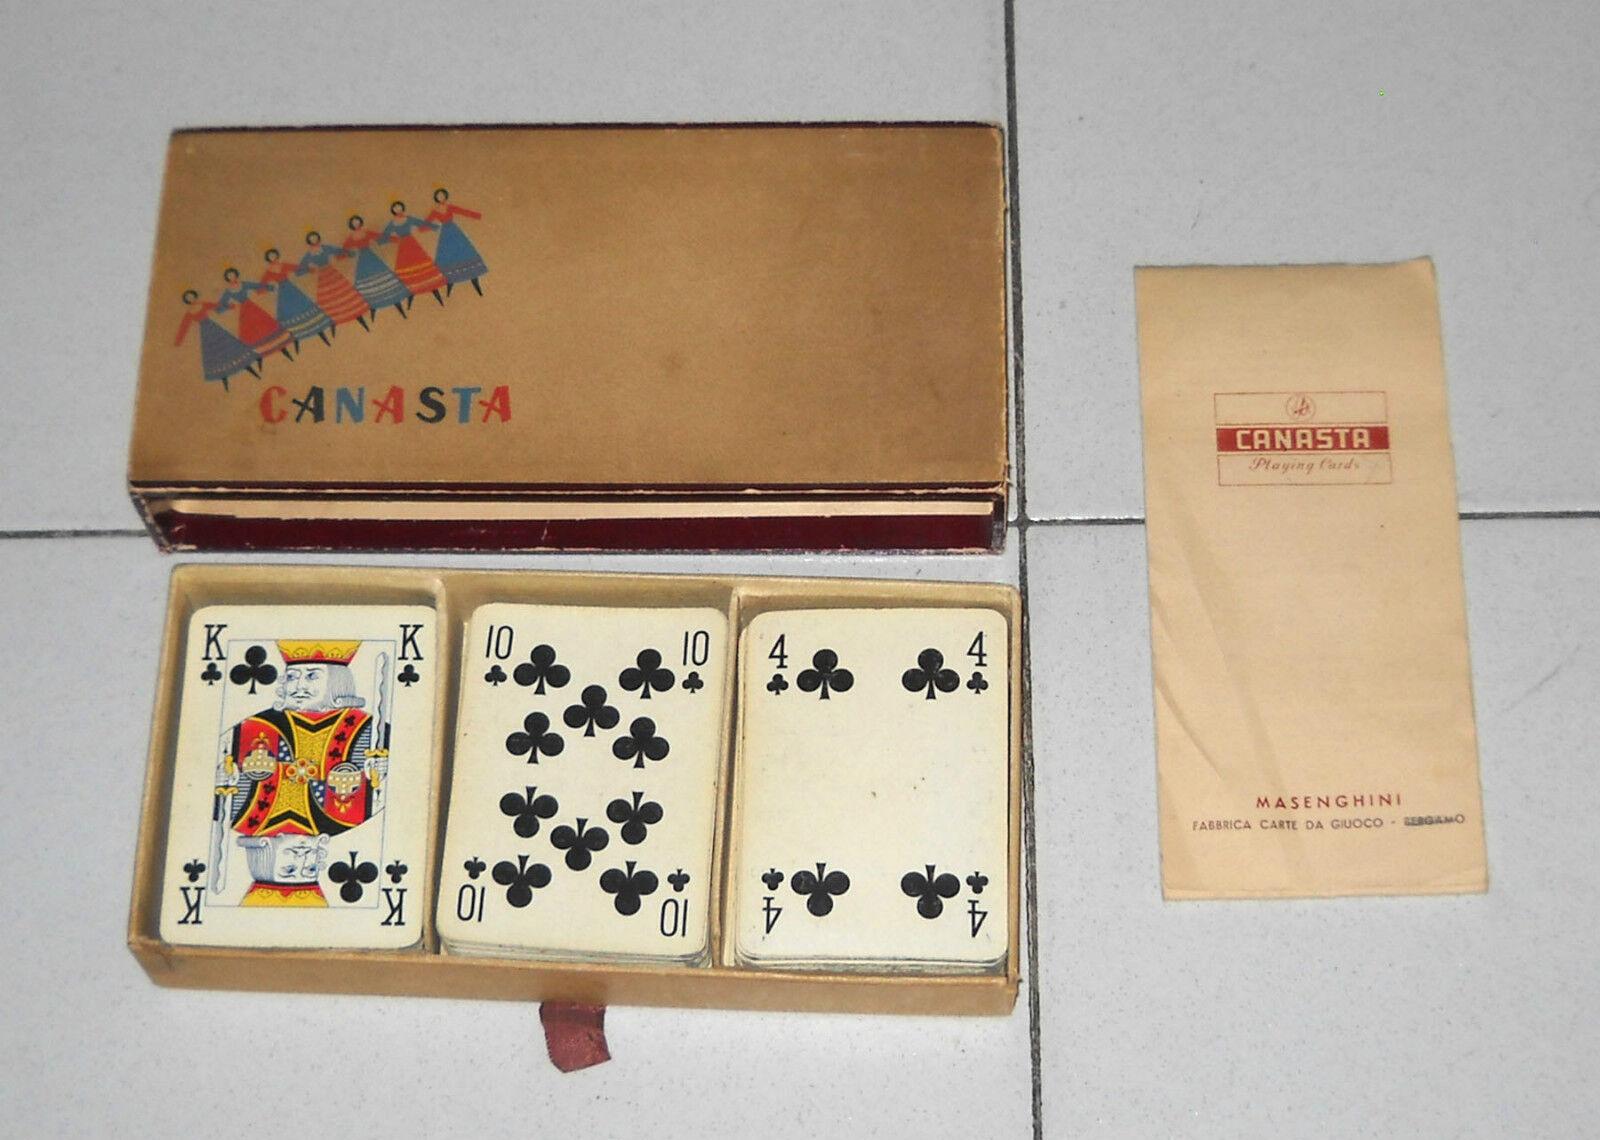 CANASTA Playing Cards MASENGHINI Bergamo 3 mazzi da 54 carte